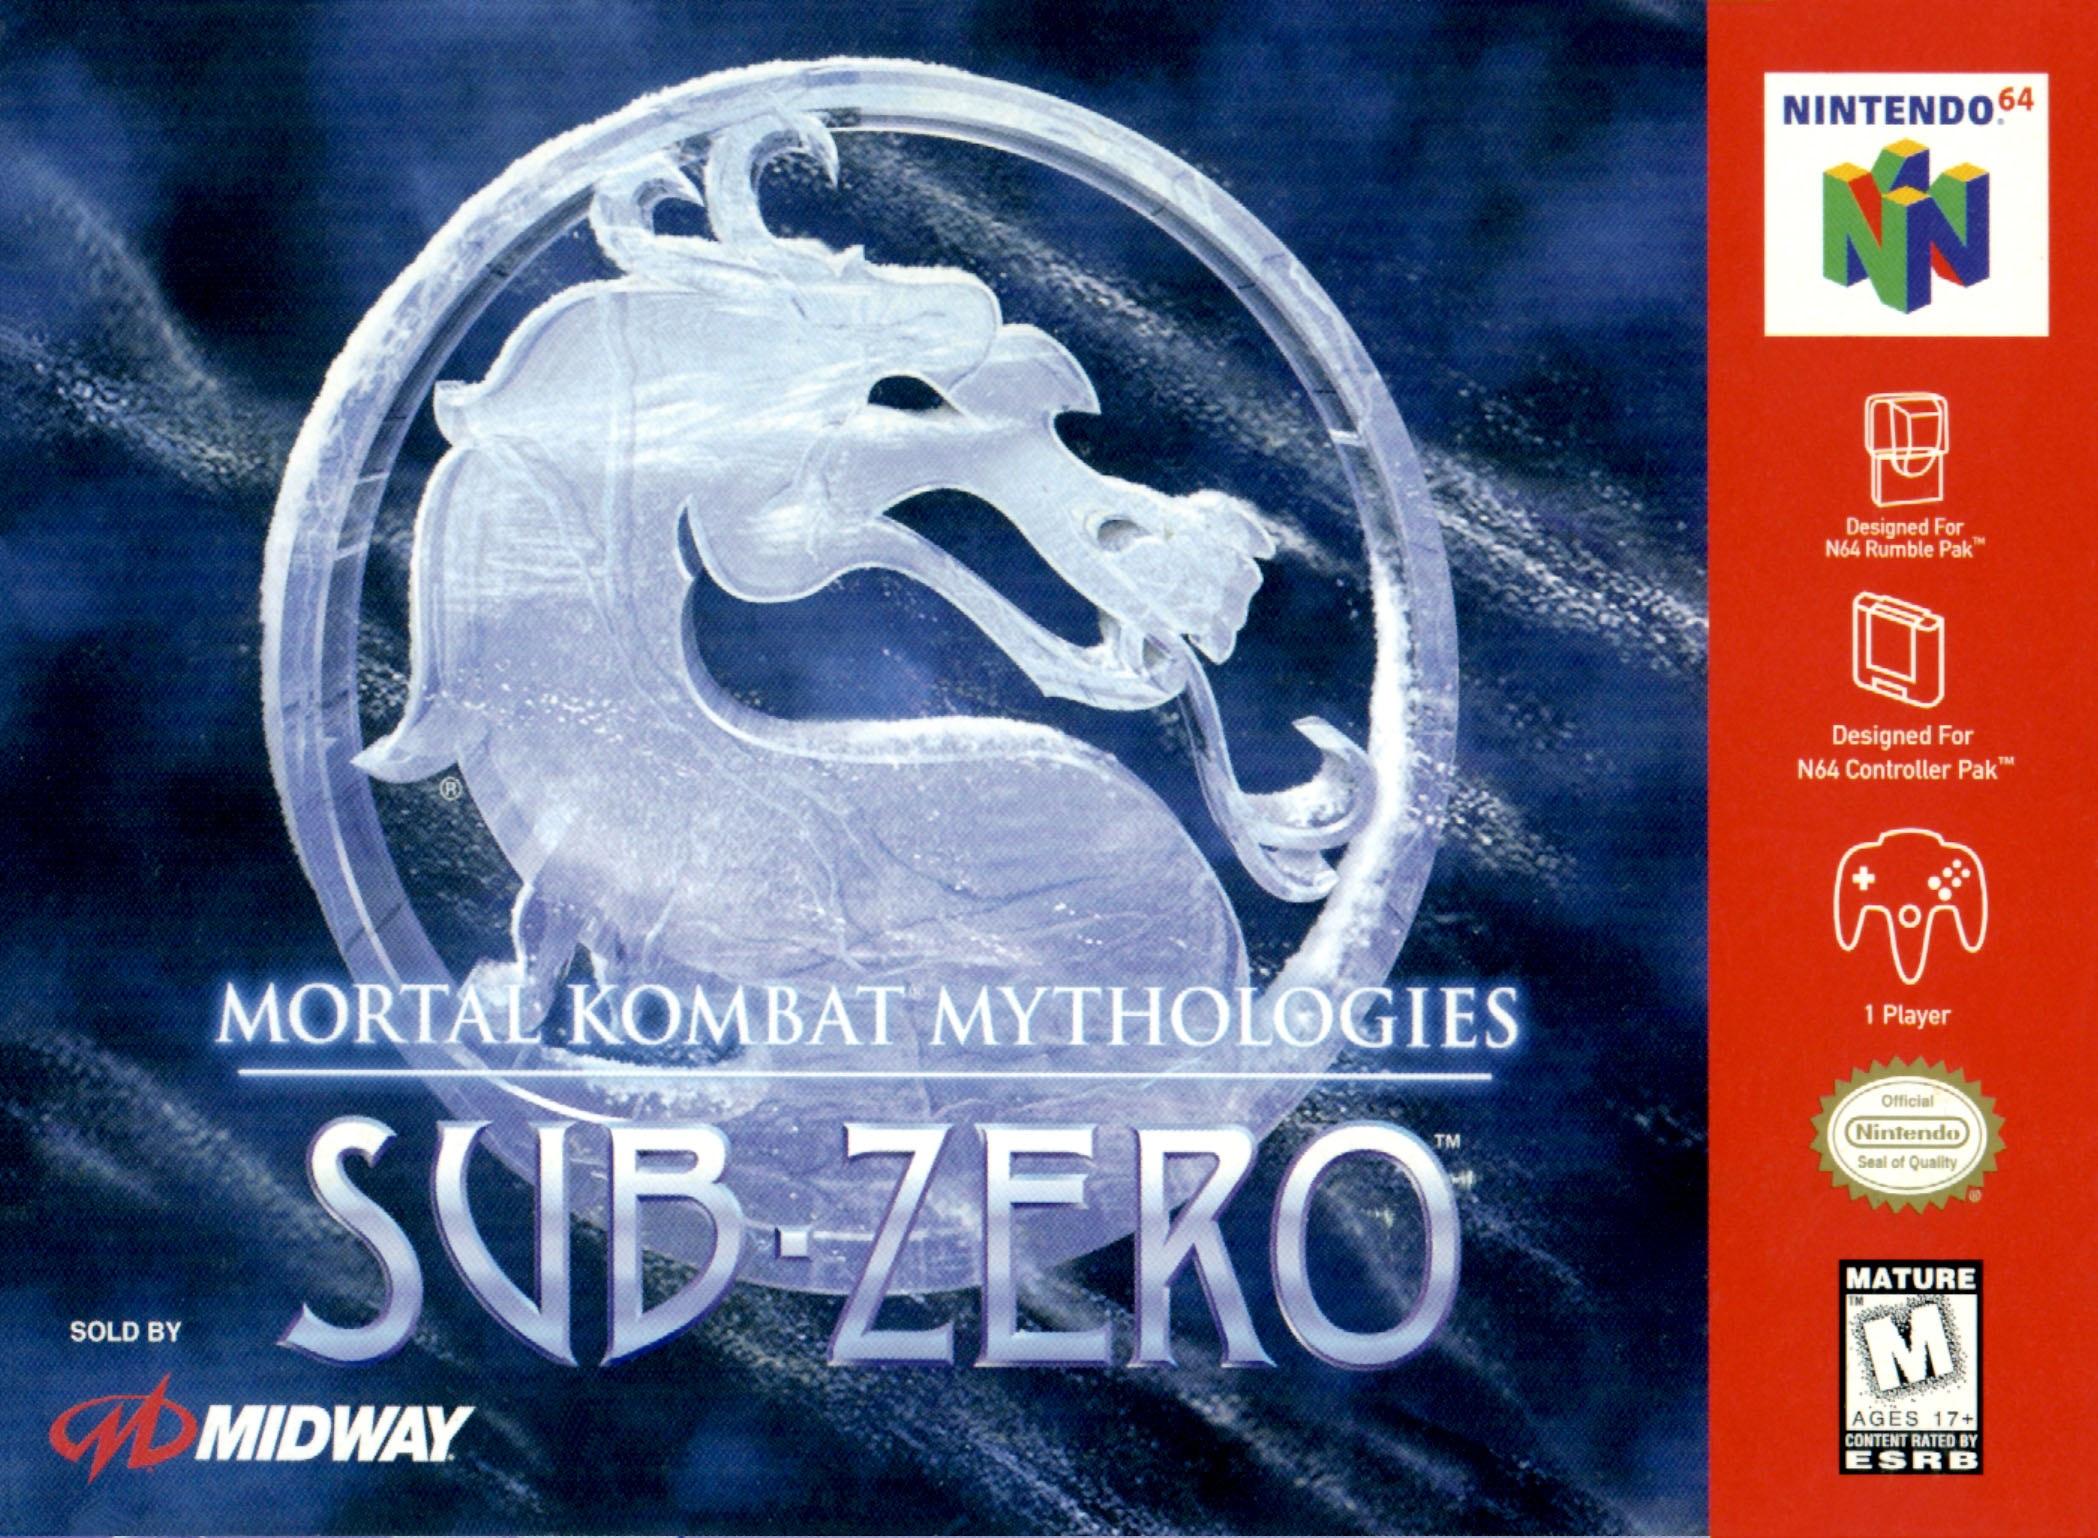 Mortal Kombat Mythologies Sub Zero Nintendo 64 Game